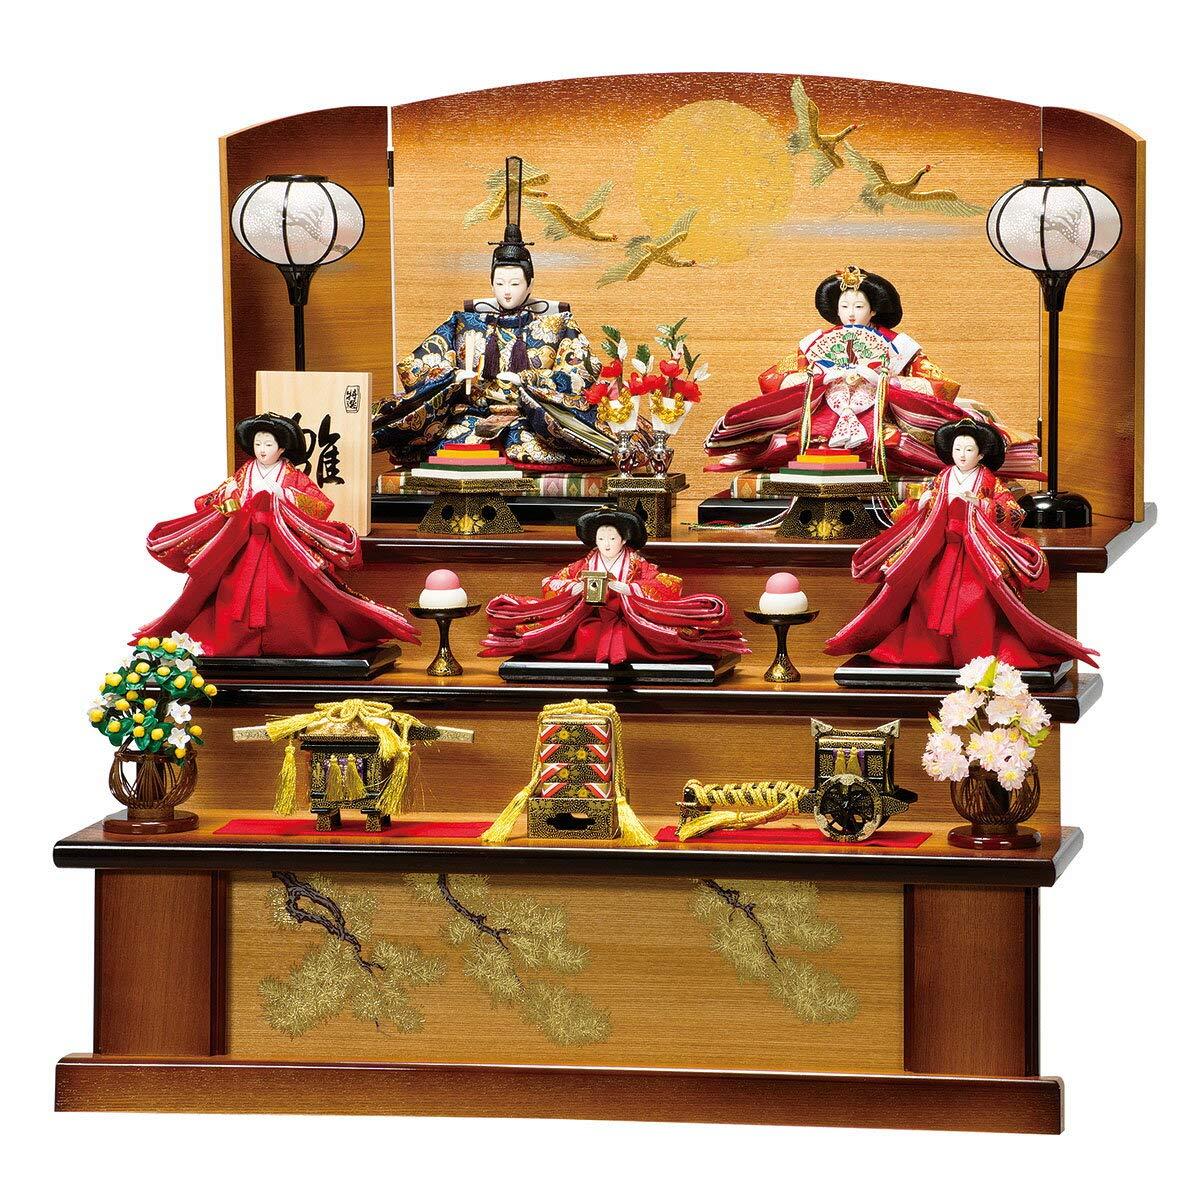 雛人形 紗良 大三五親王 芥子官女揃 ひな人形 三段飾り 平安豊久 HNH-303852 HD-031   B07KCYG2WK